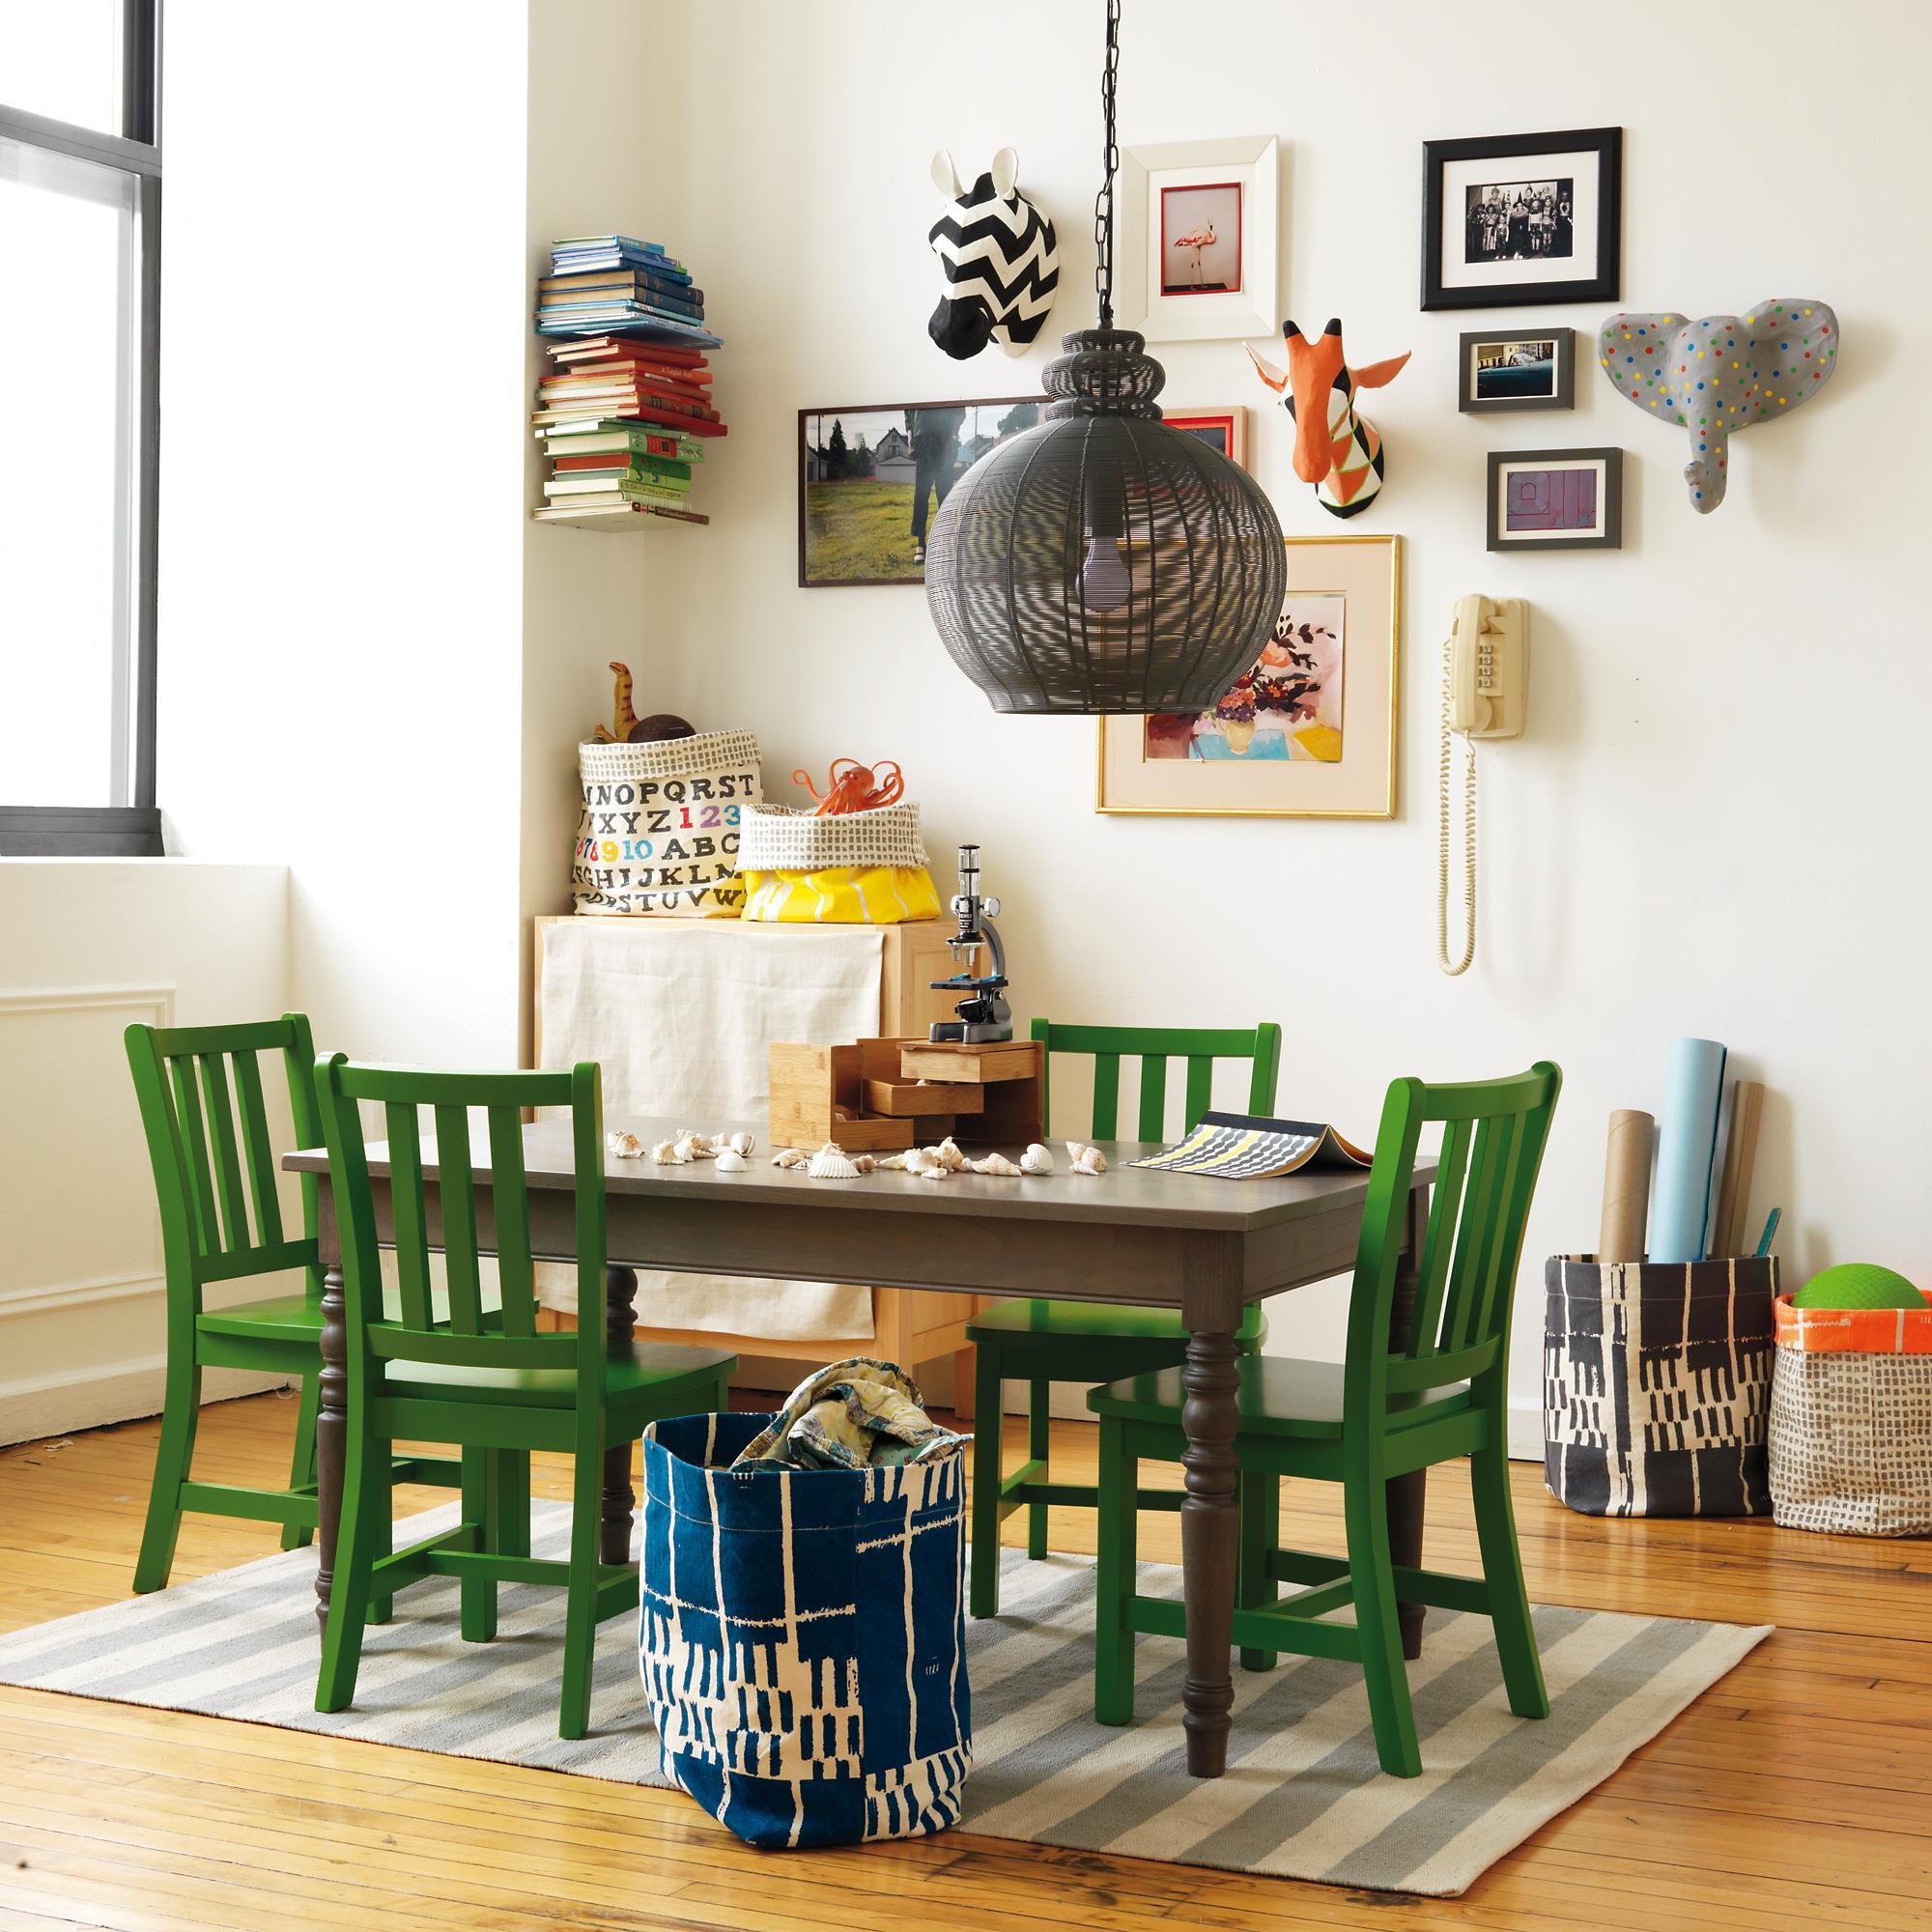 adjustable-height-everlasting-play-table-grey-2